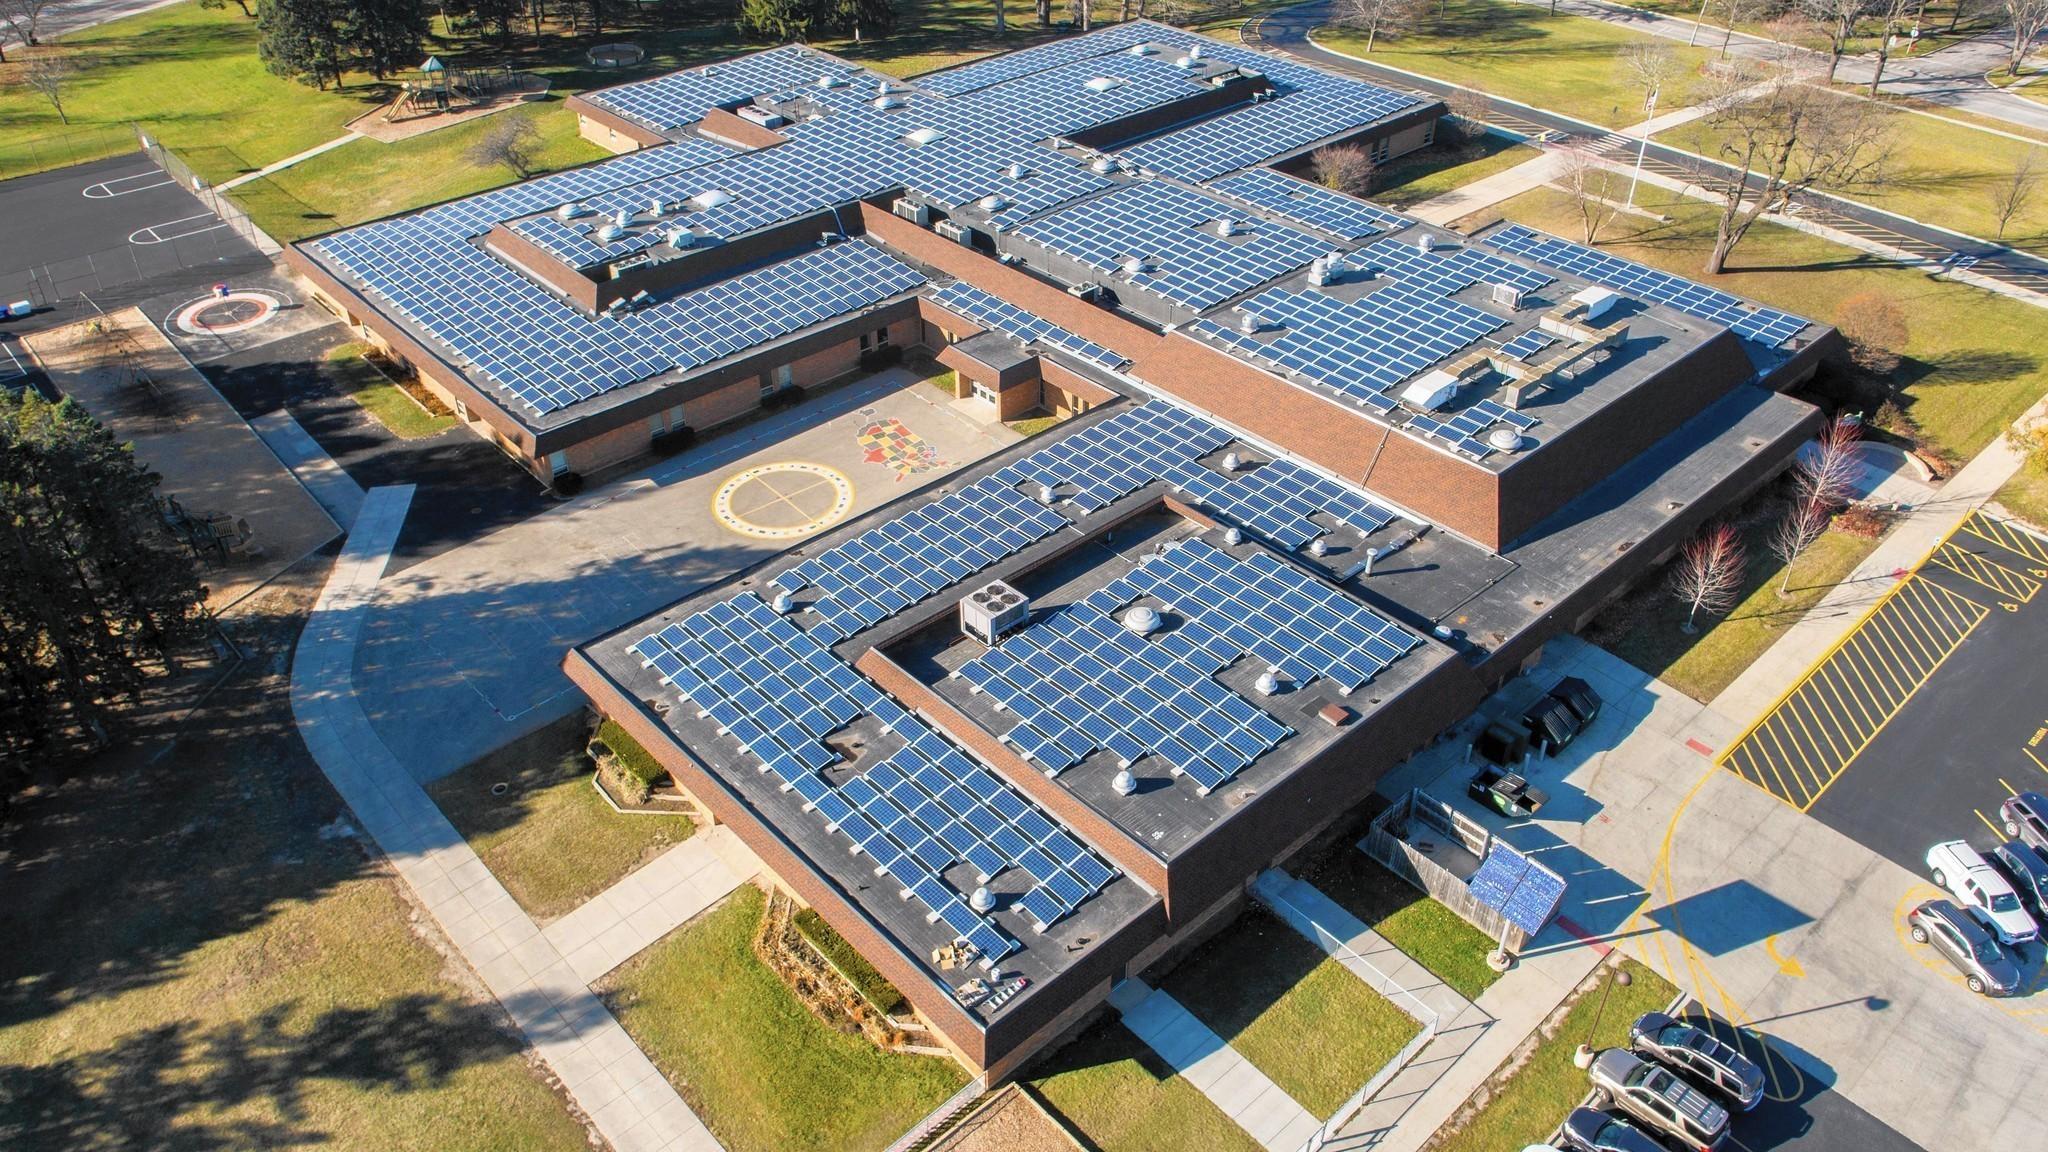 Libertyville Schools Solar Panels Help Teach Cut Costs